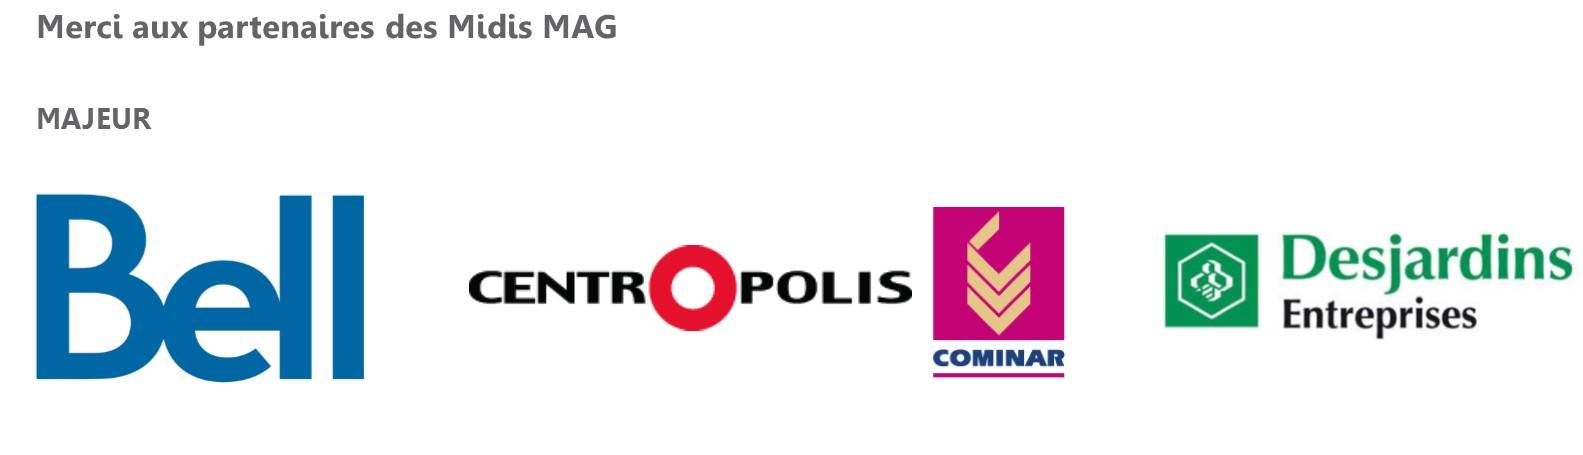 Bannière Midi MAG